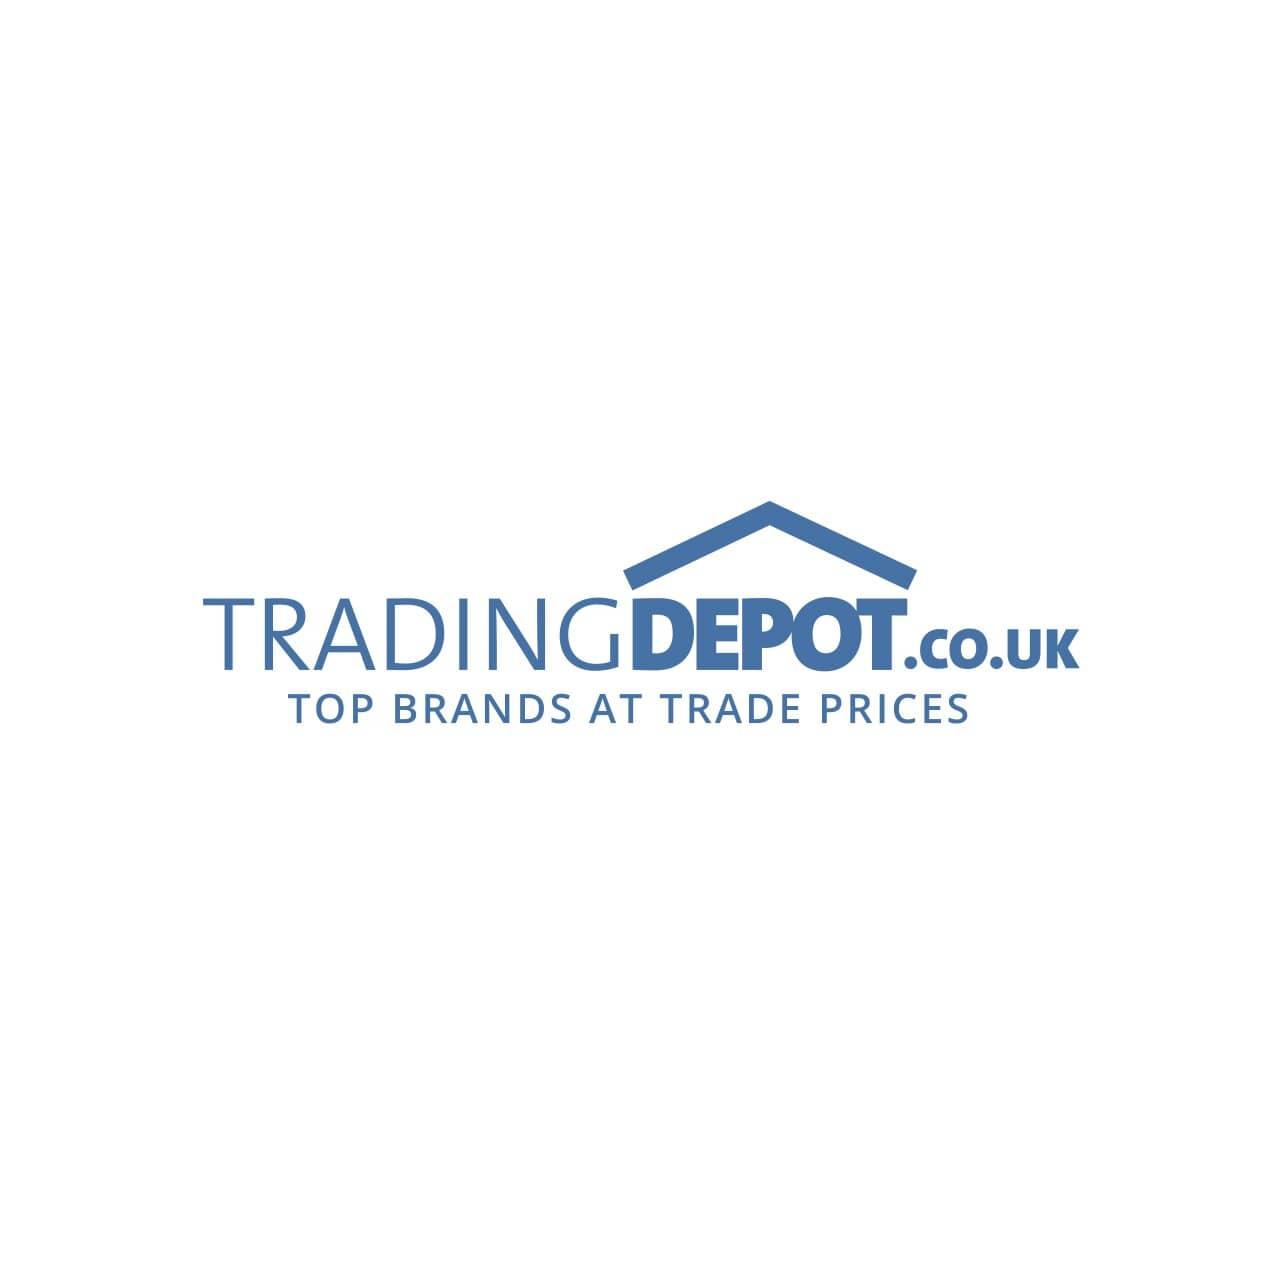 BlueSpot 24201 Plastering Trowel Plastic Handle 11 x 4.3//4in